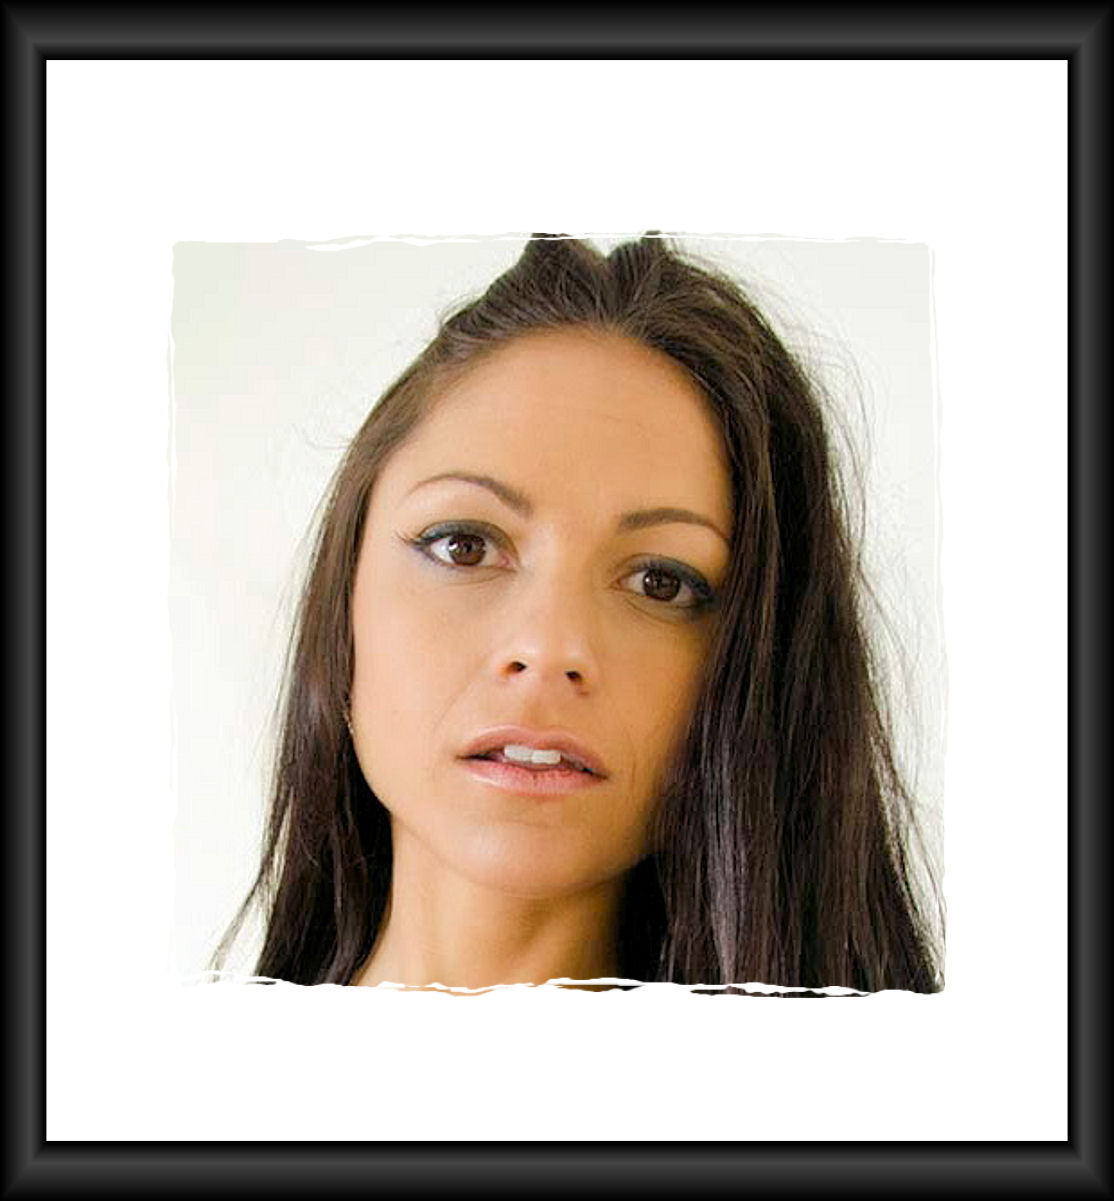 Marta LaCroft face